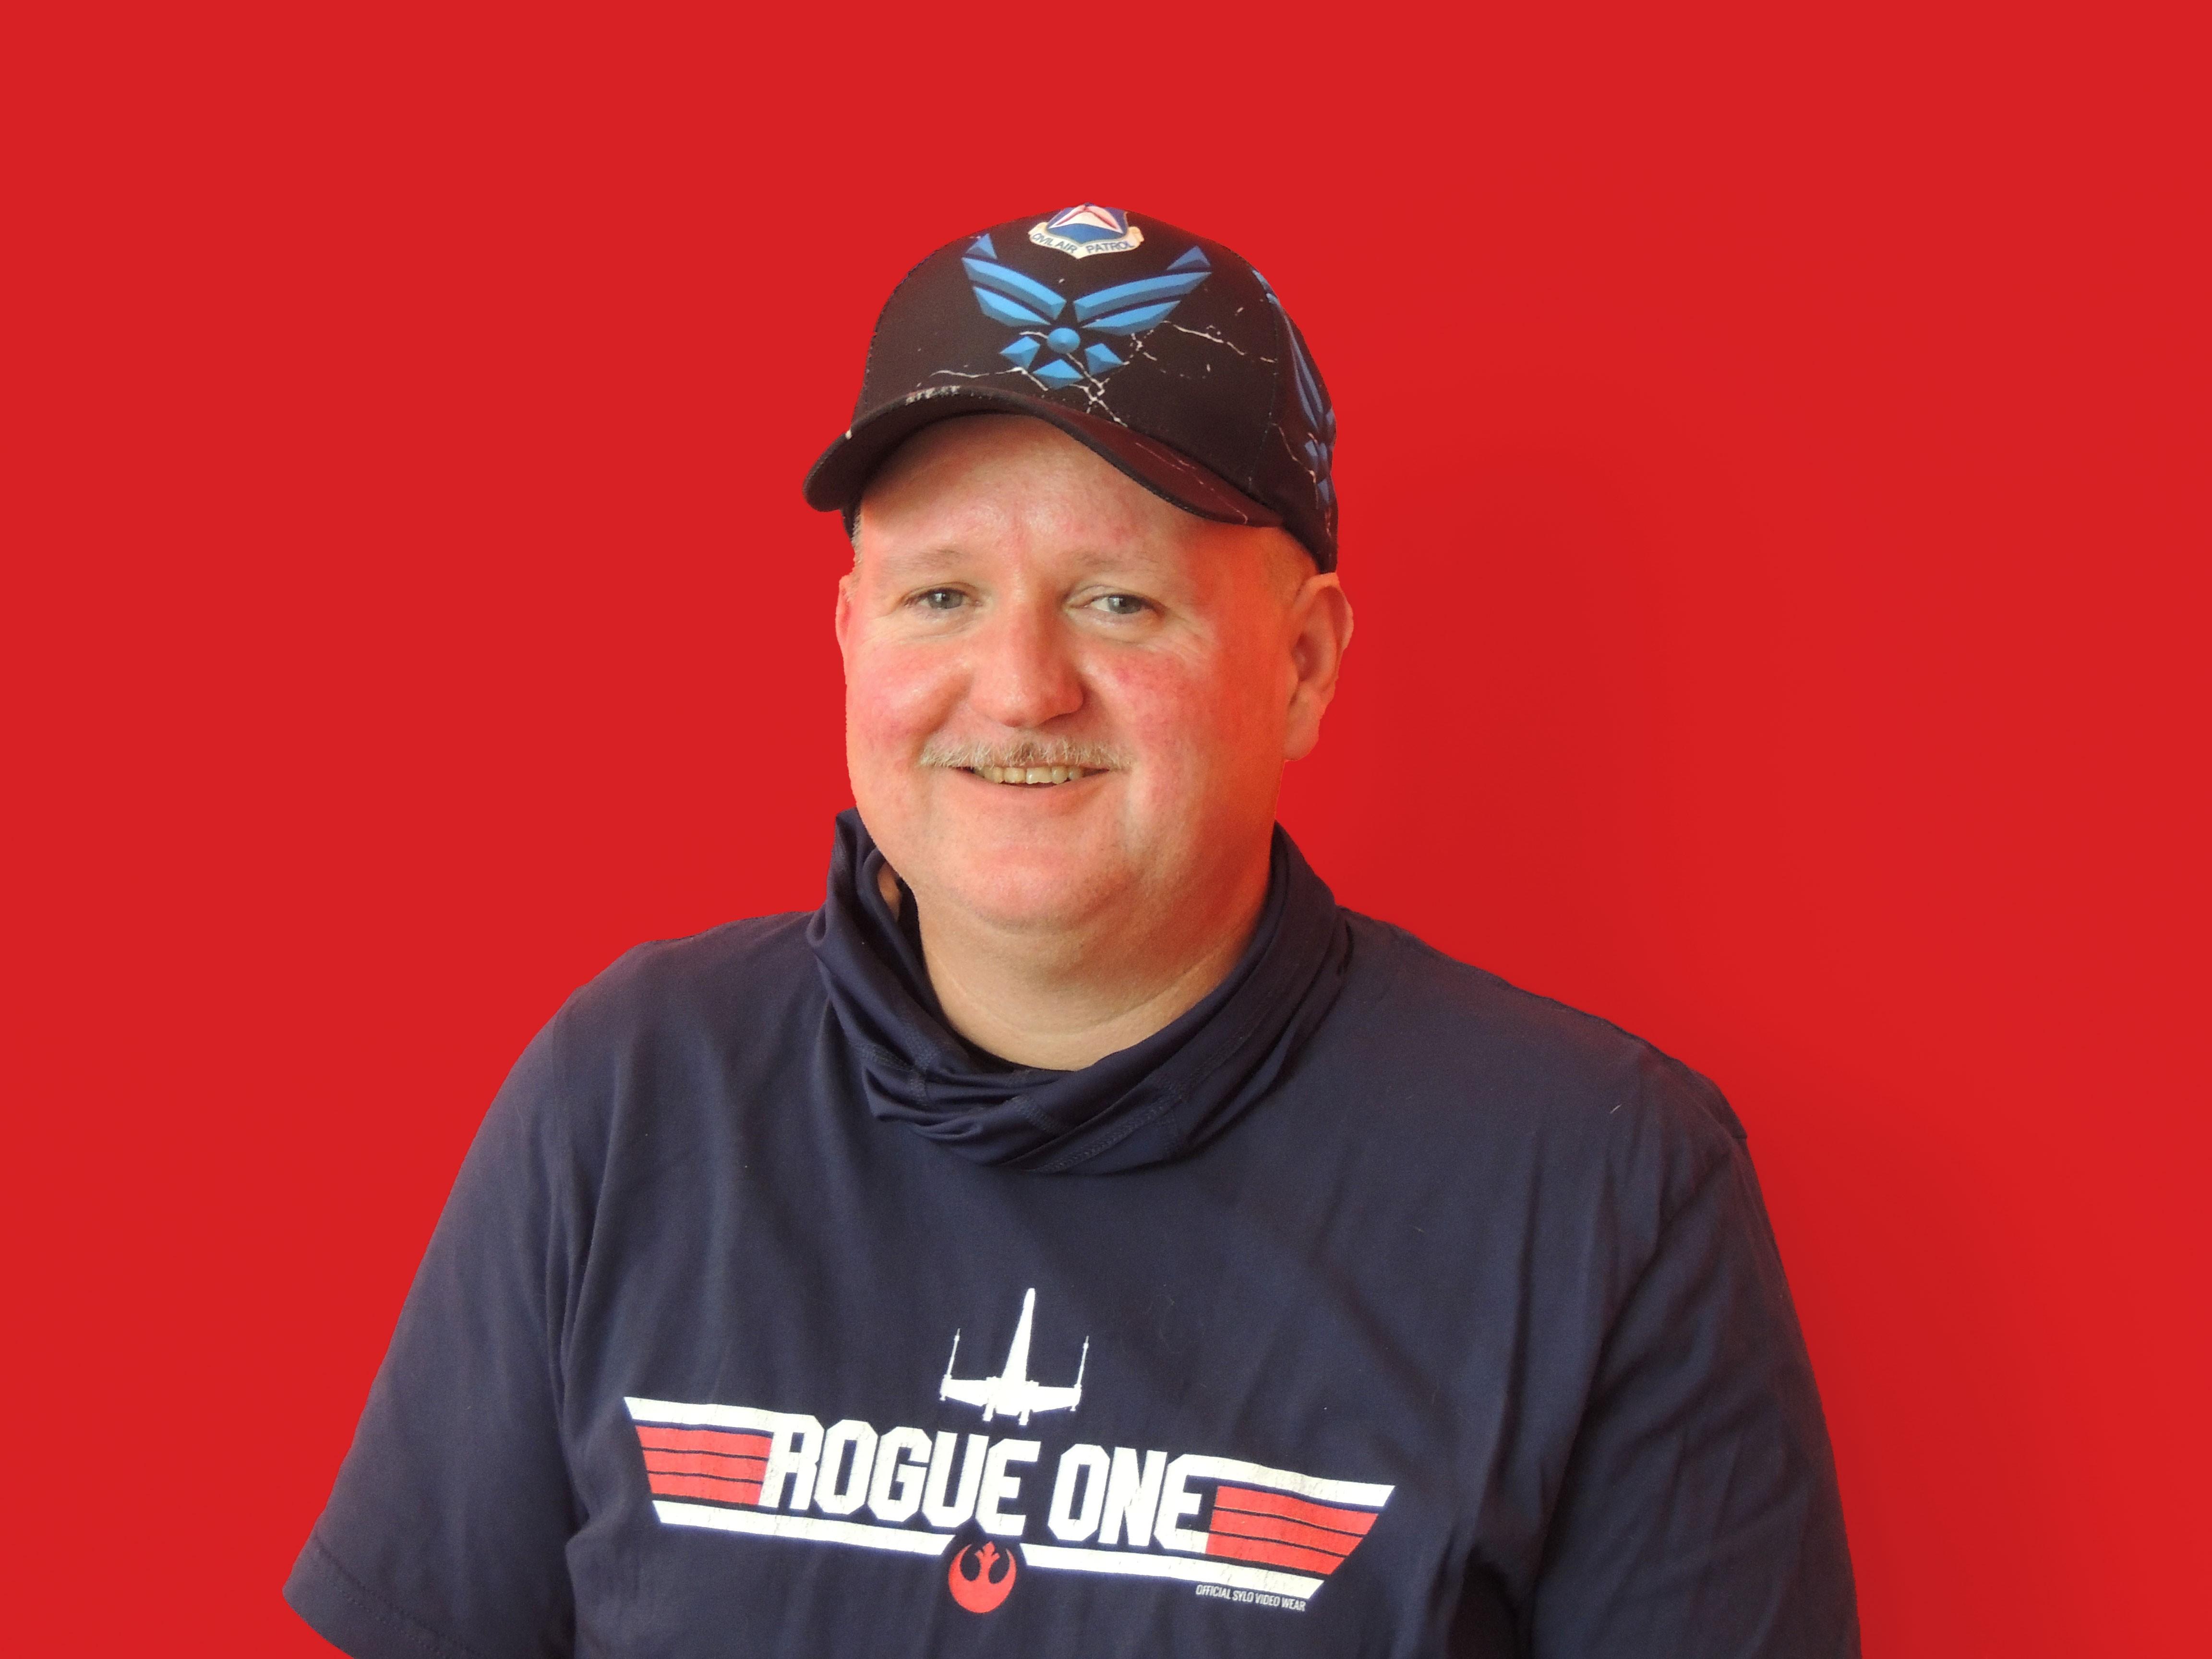 Headshot of Steve Savage, Raymond Employee, and air show volunteer.